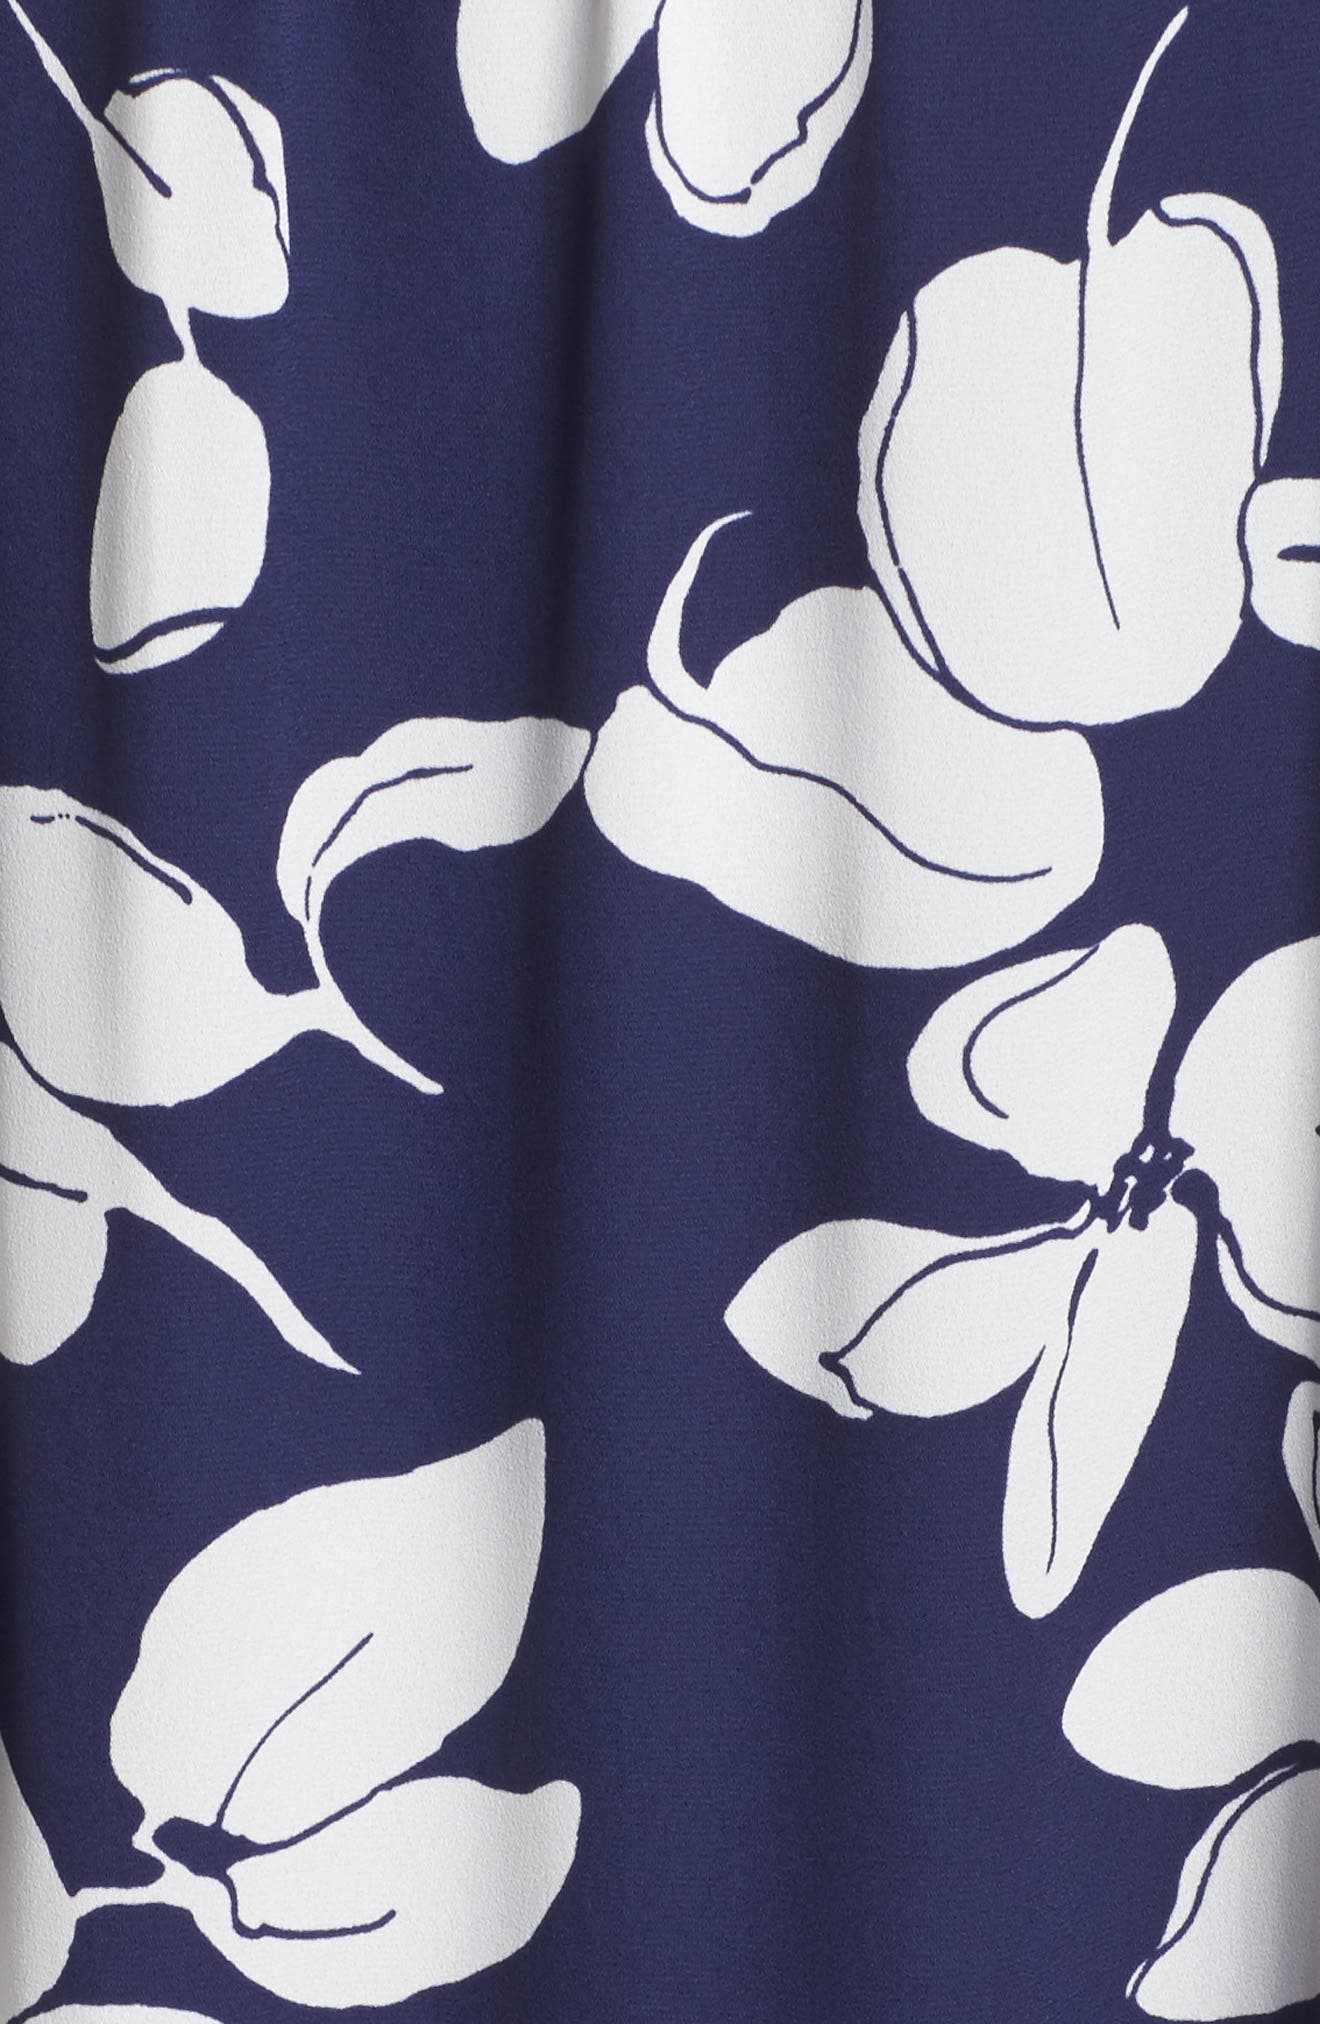 Simple Delight Ruffle Maxi Dress,                             Alternate thumbnail 5, color,                             480